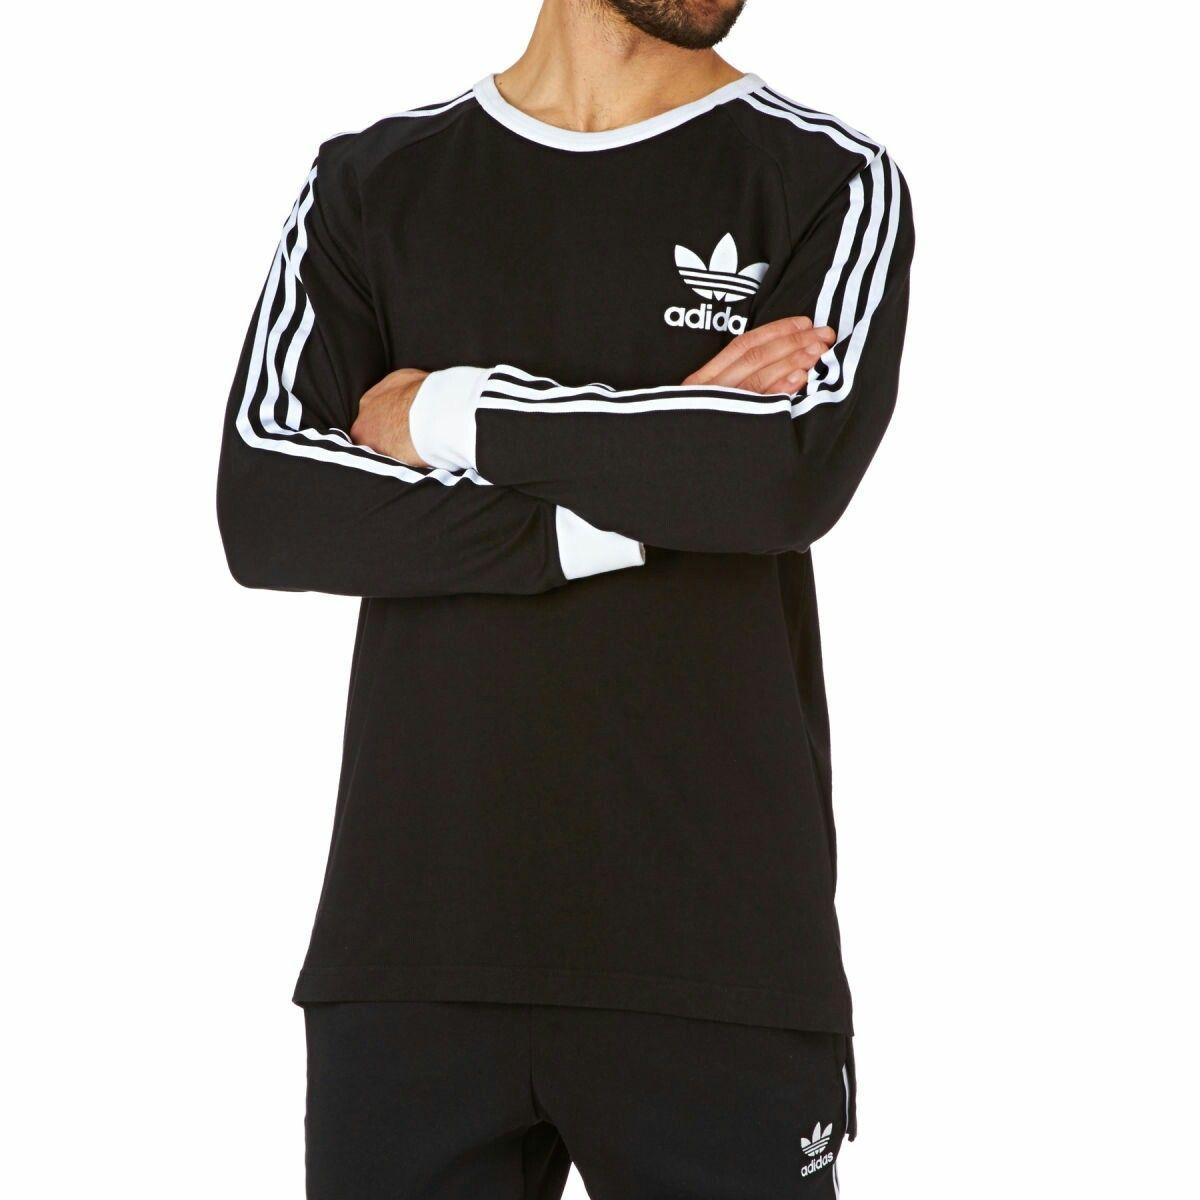 Adidas Originals' crew neck long sleeve tee in black